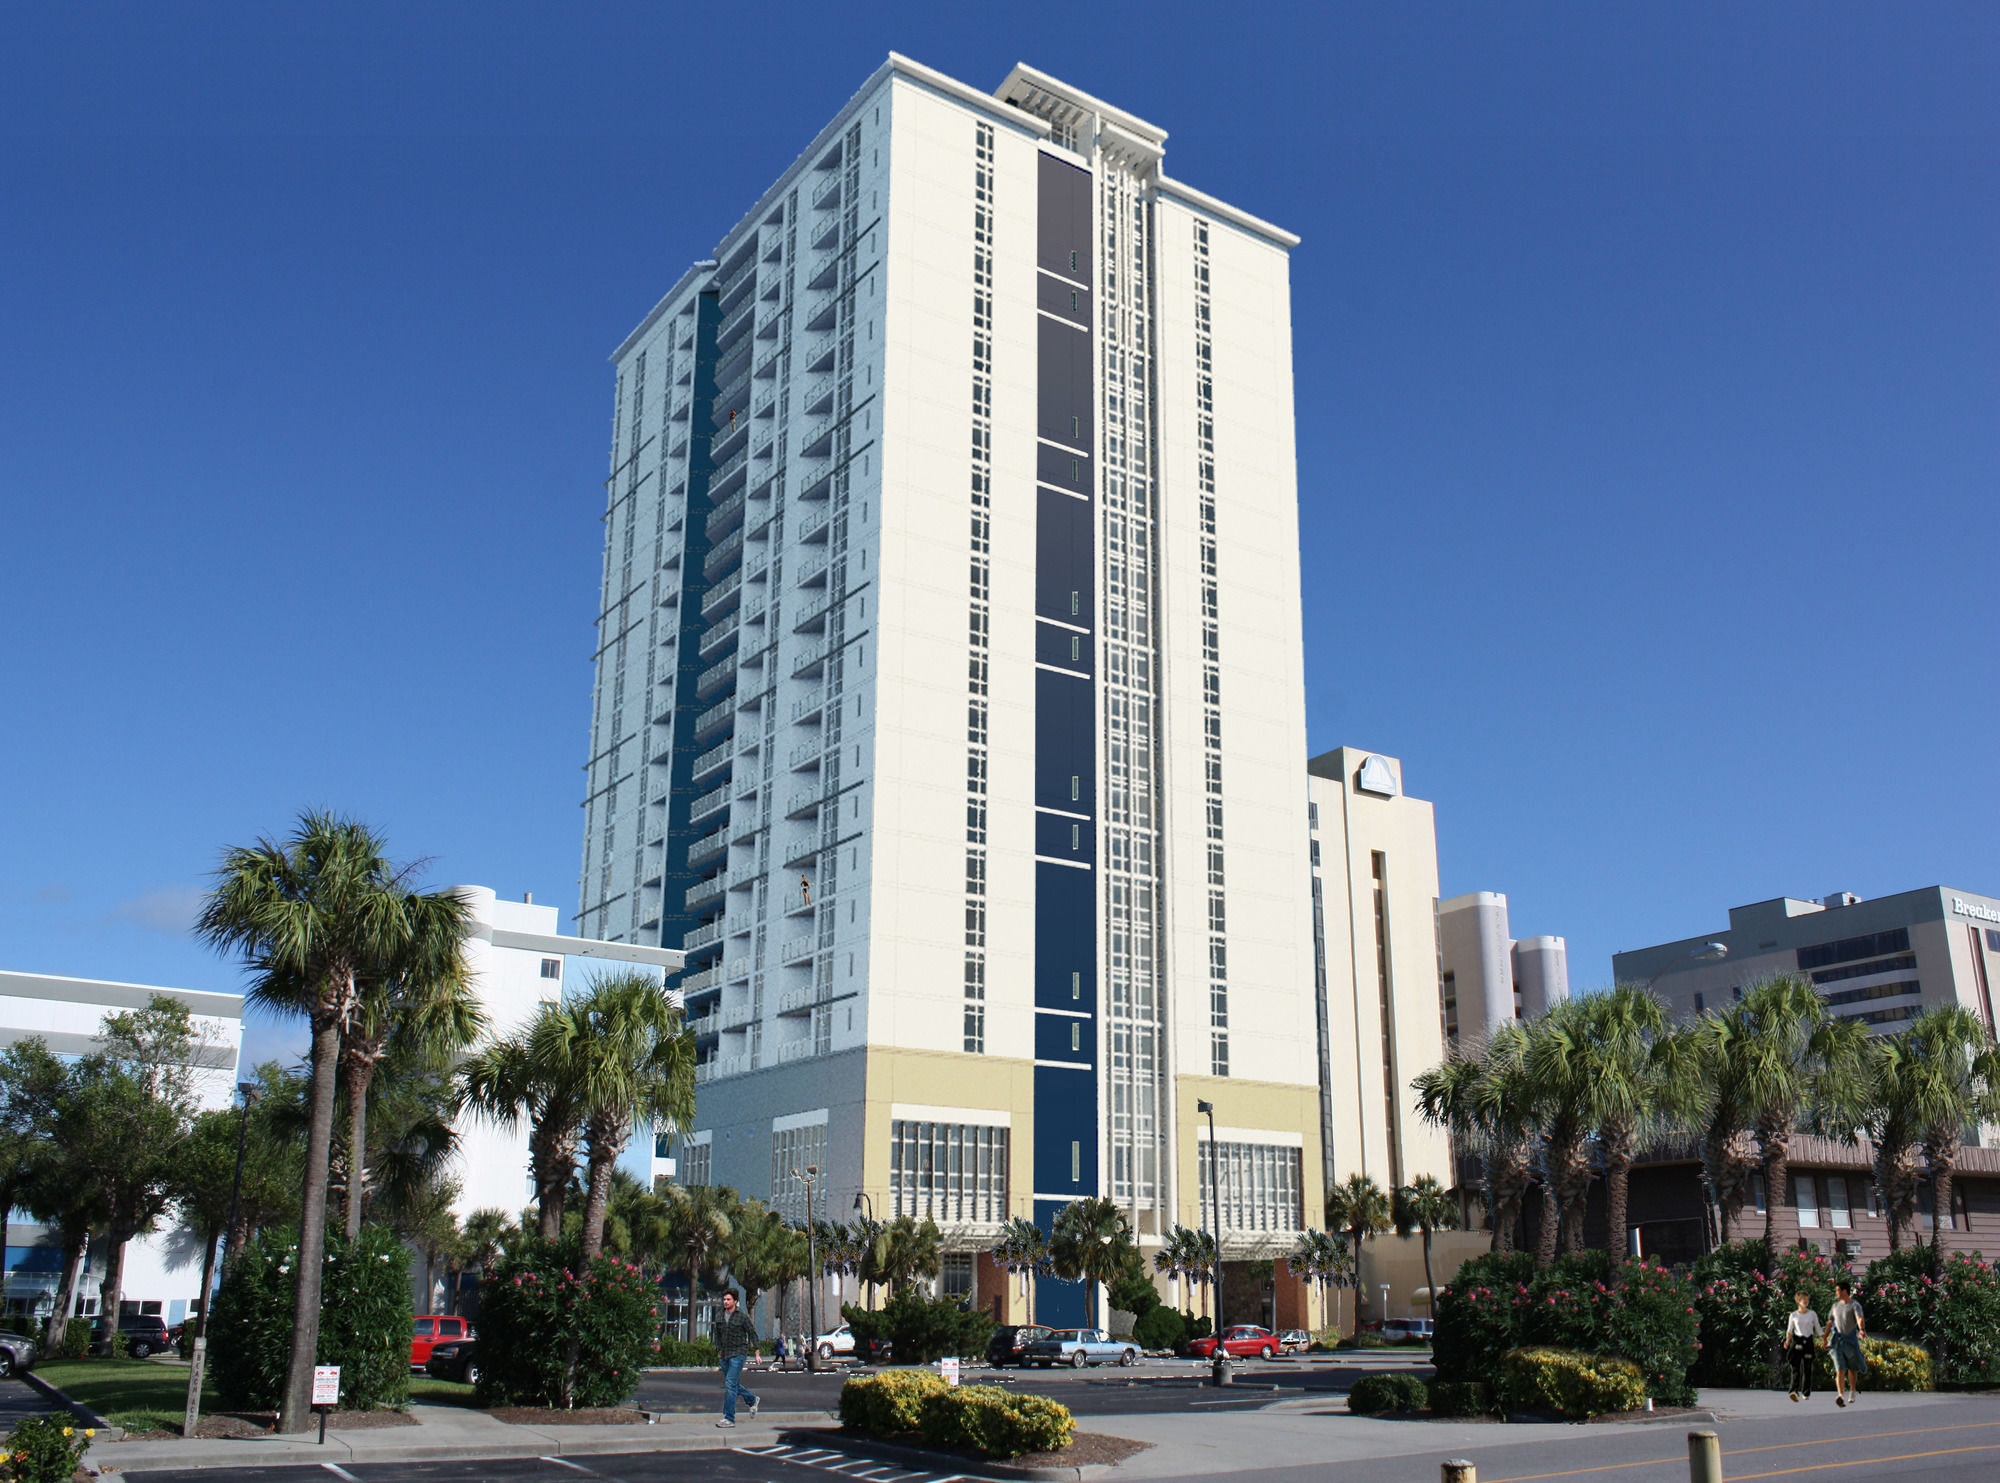 Hilton Grand Vacations Myrtle Beach